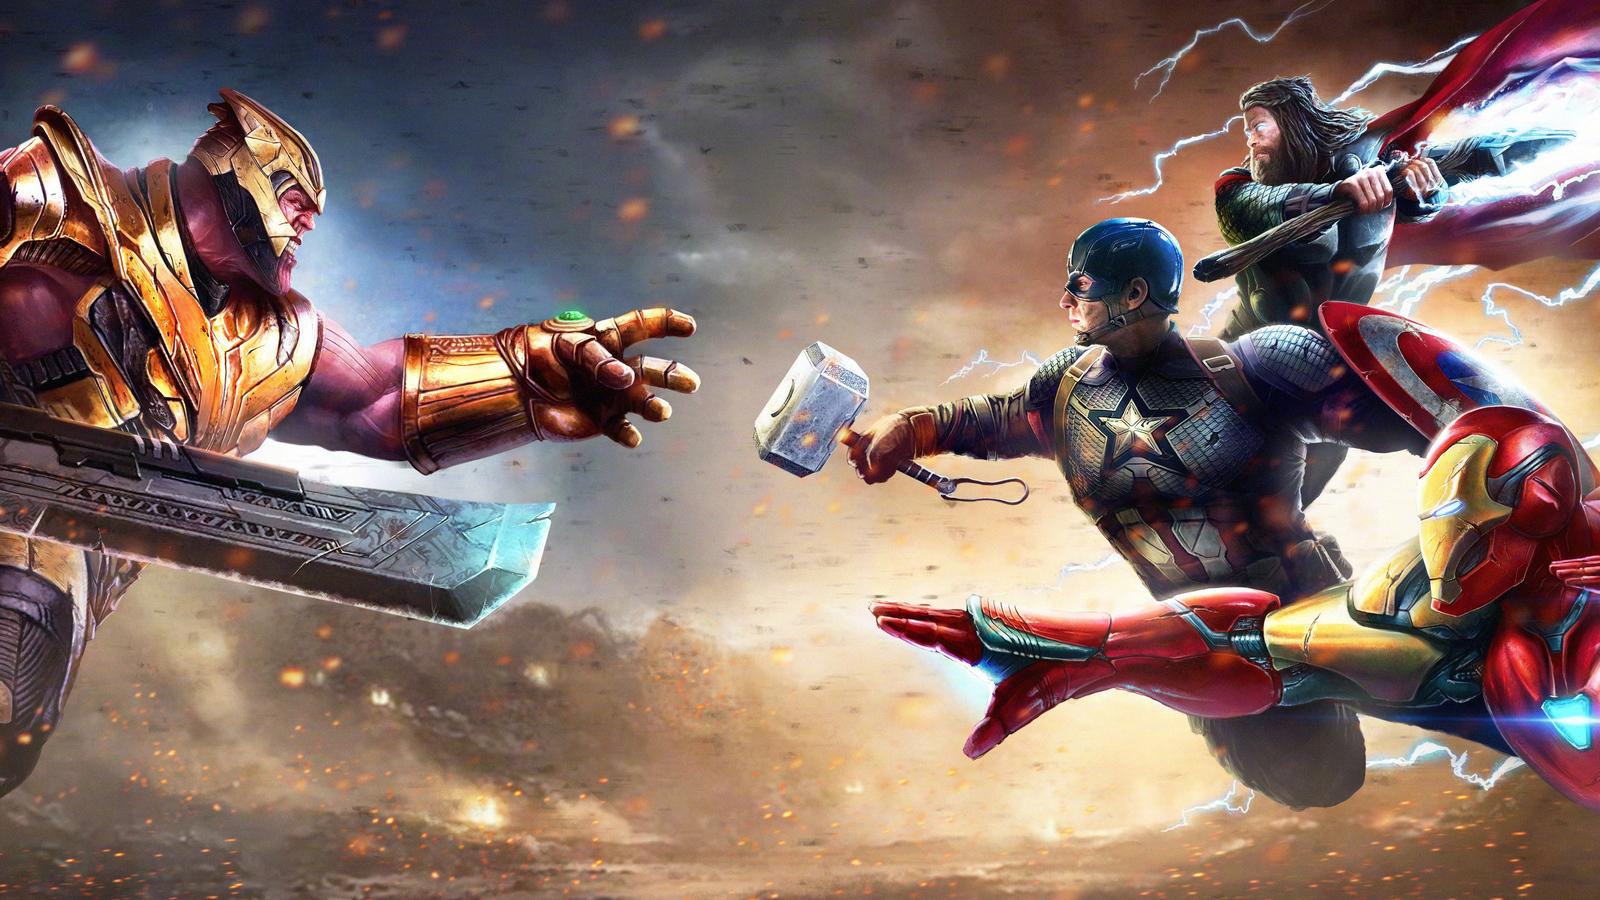 thanos-vs-iron-man-thor-captain-america-49.jpg